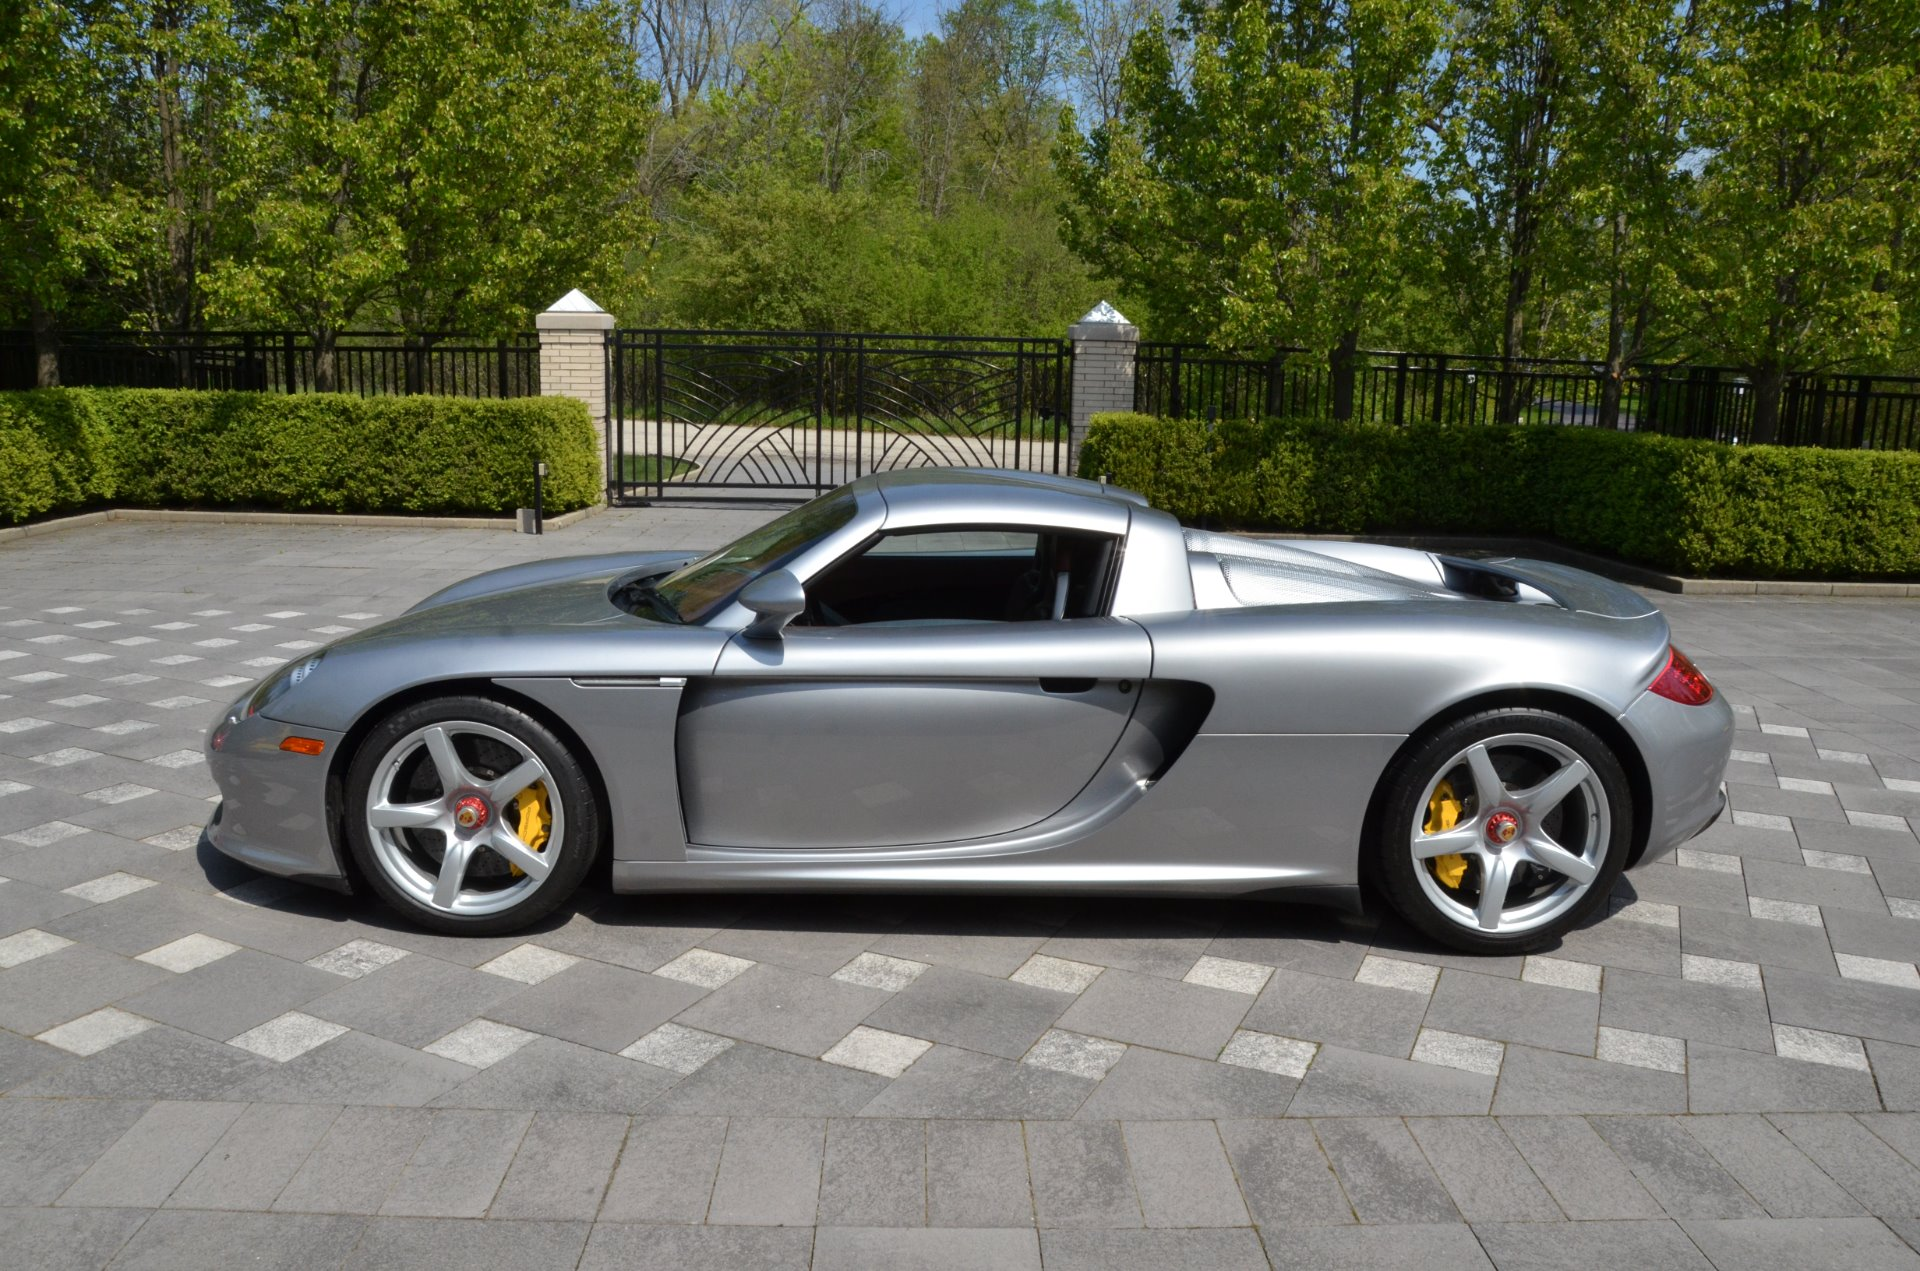 Porsche carrera gt drom